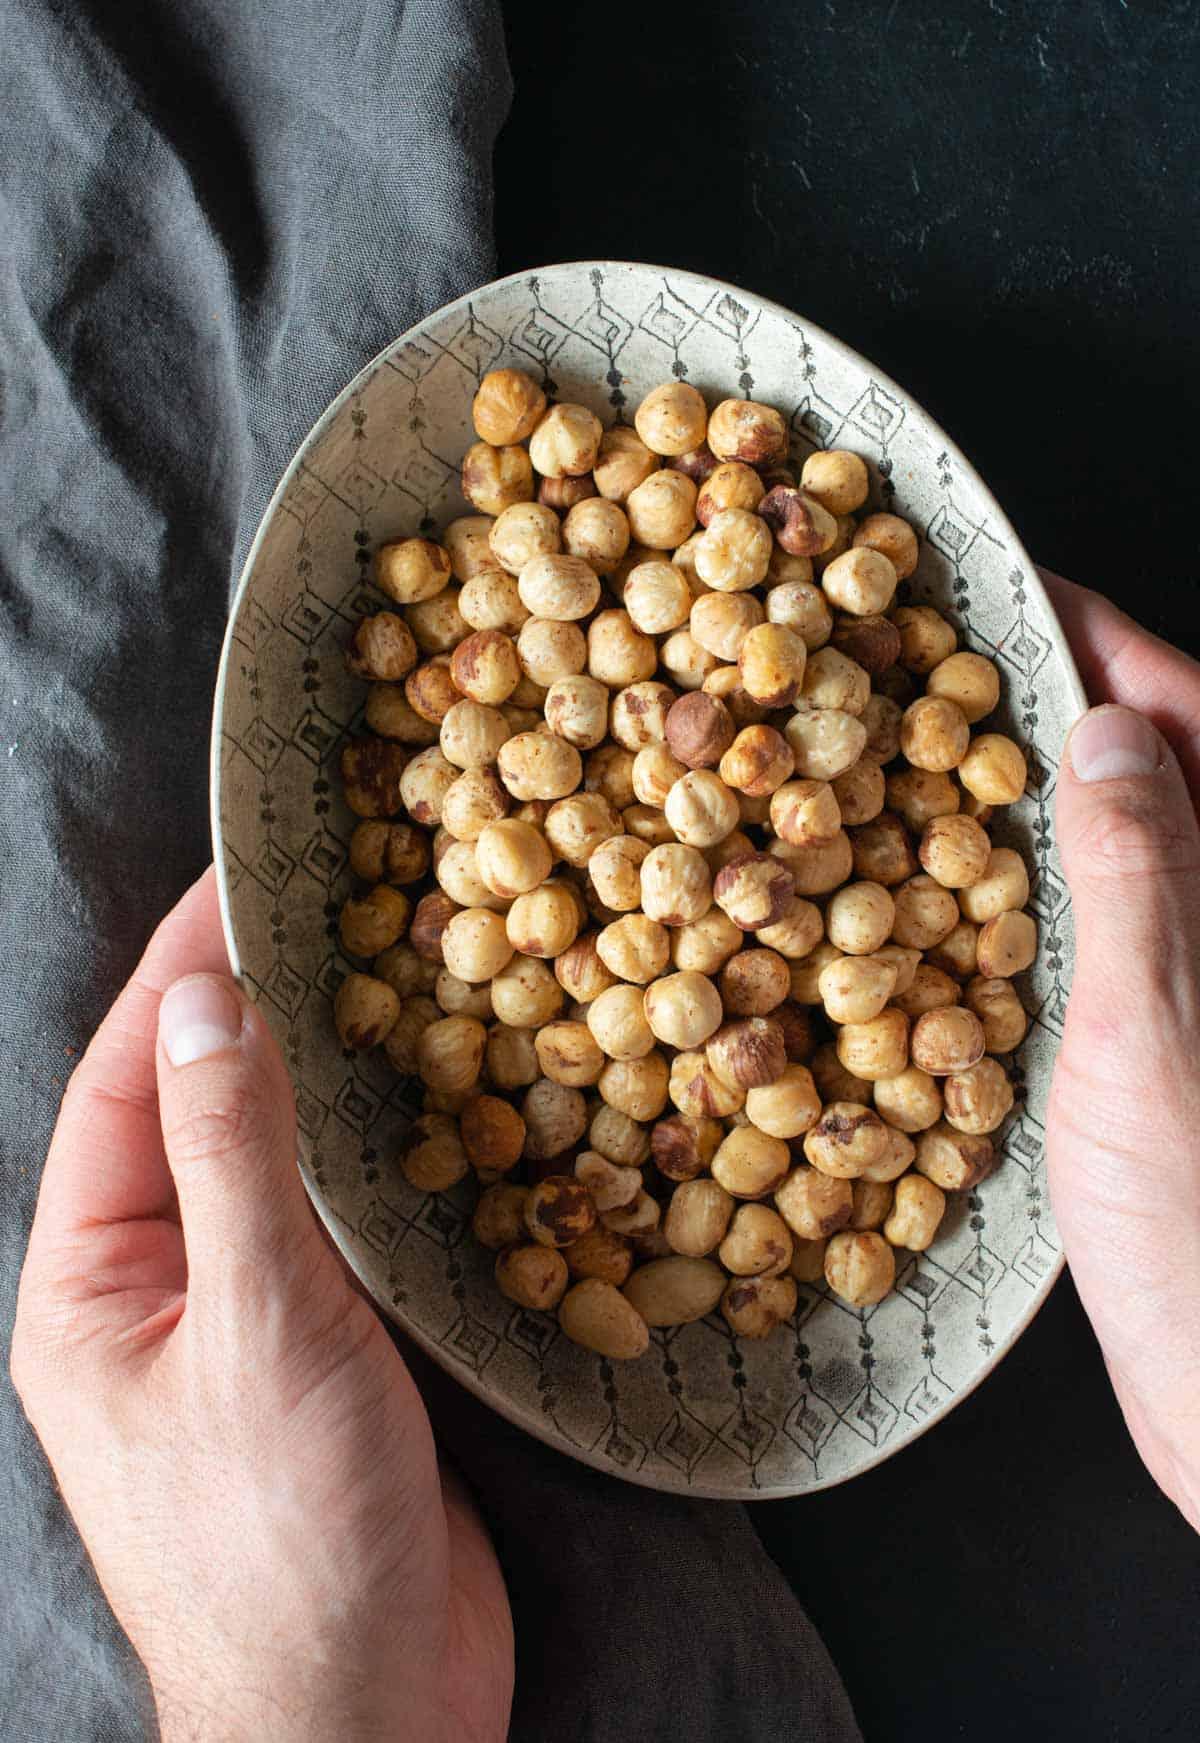 Image of the hazelnuts